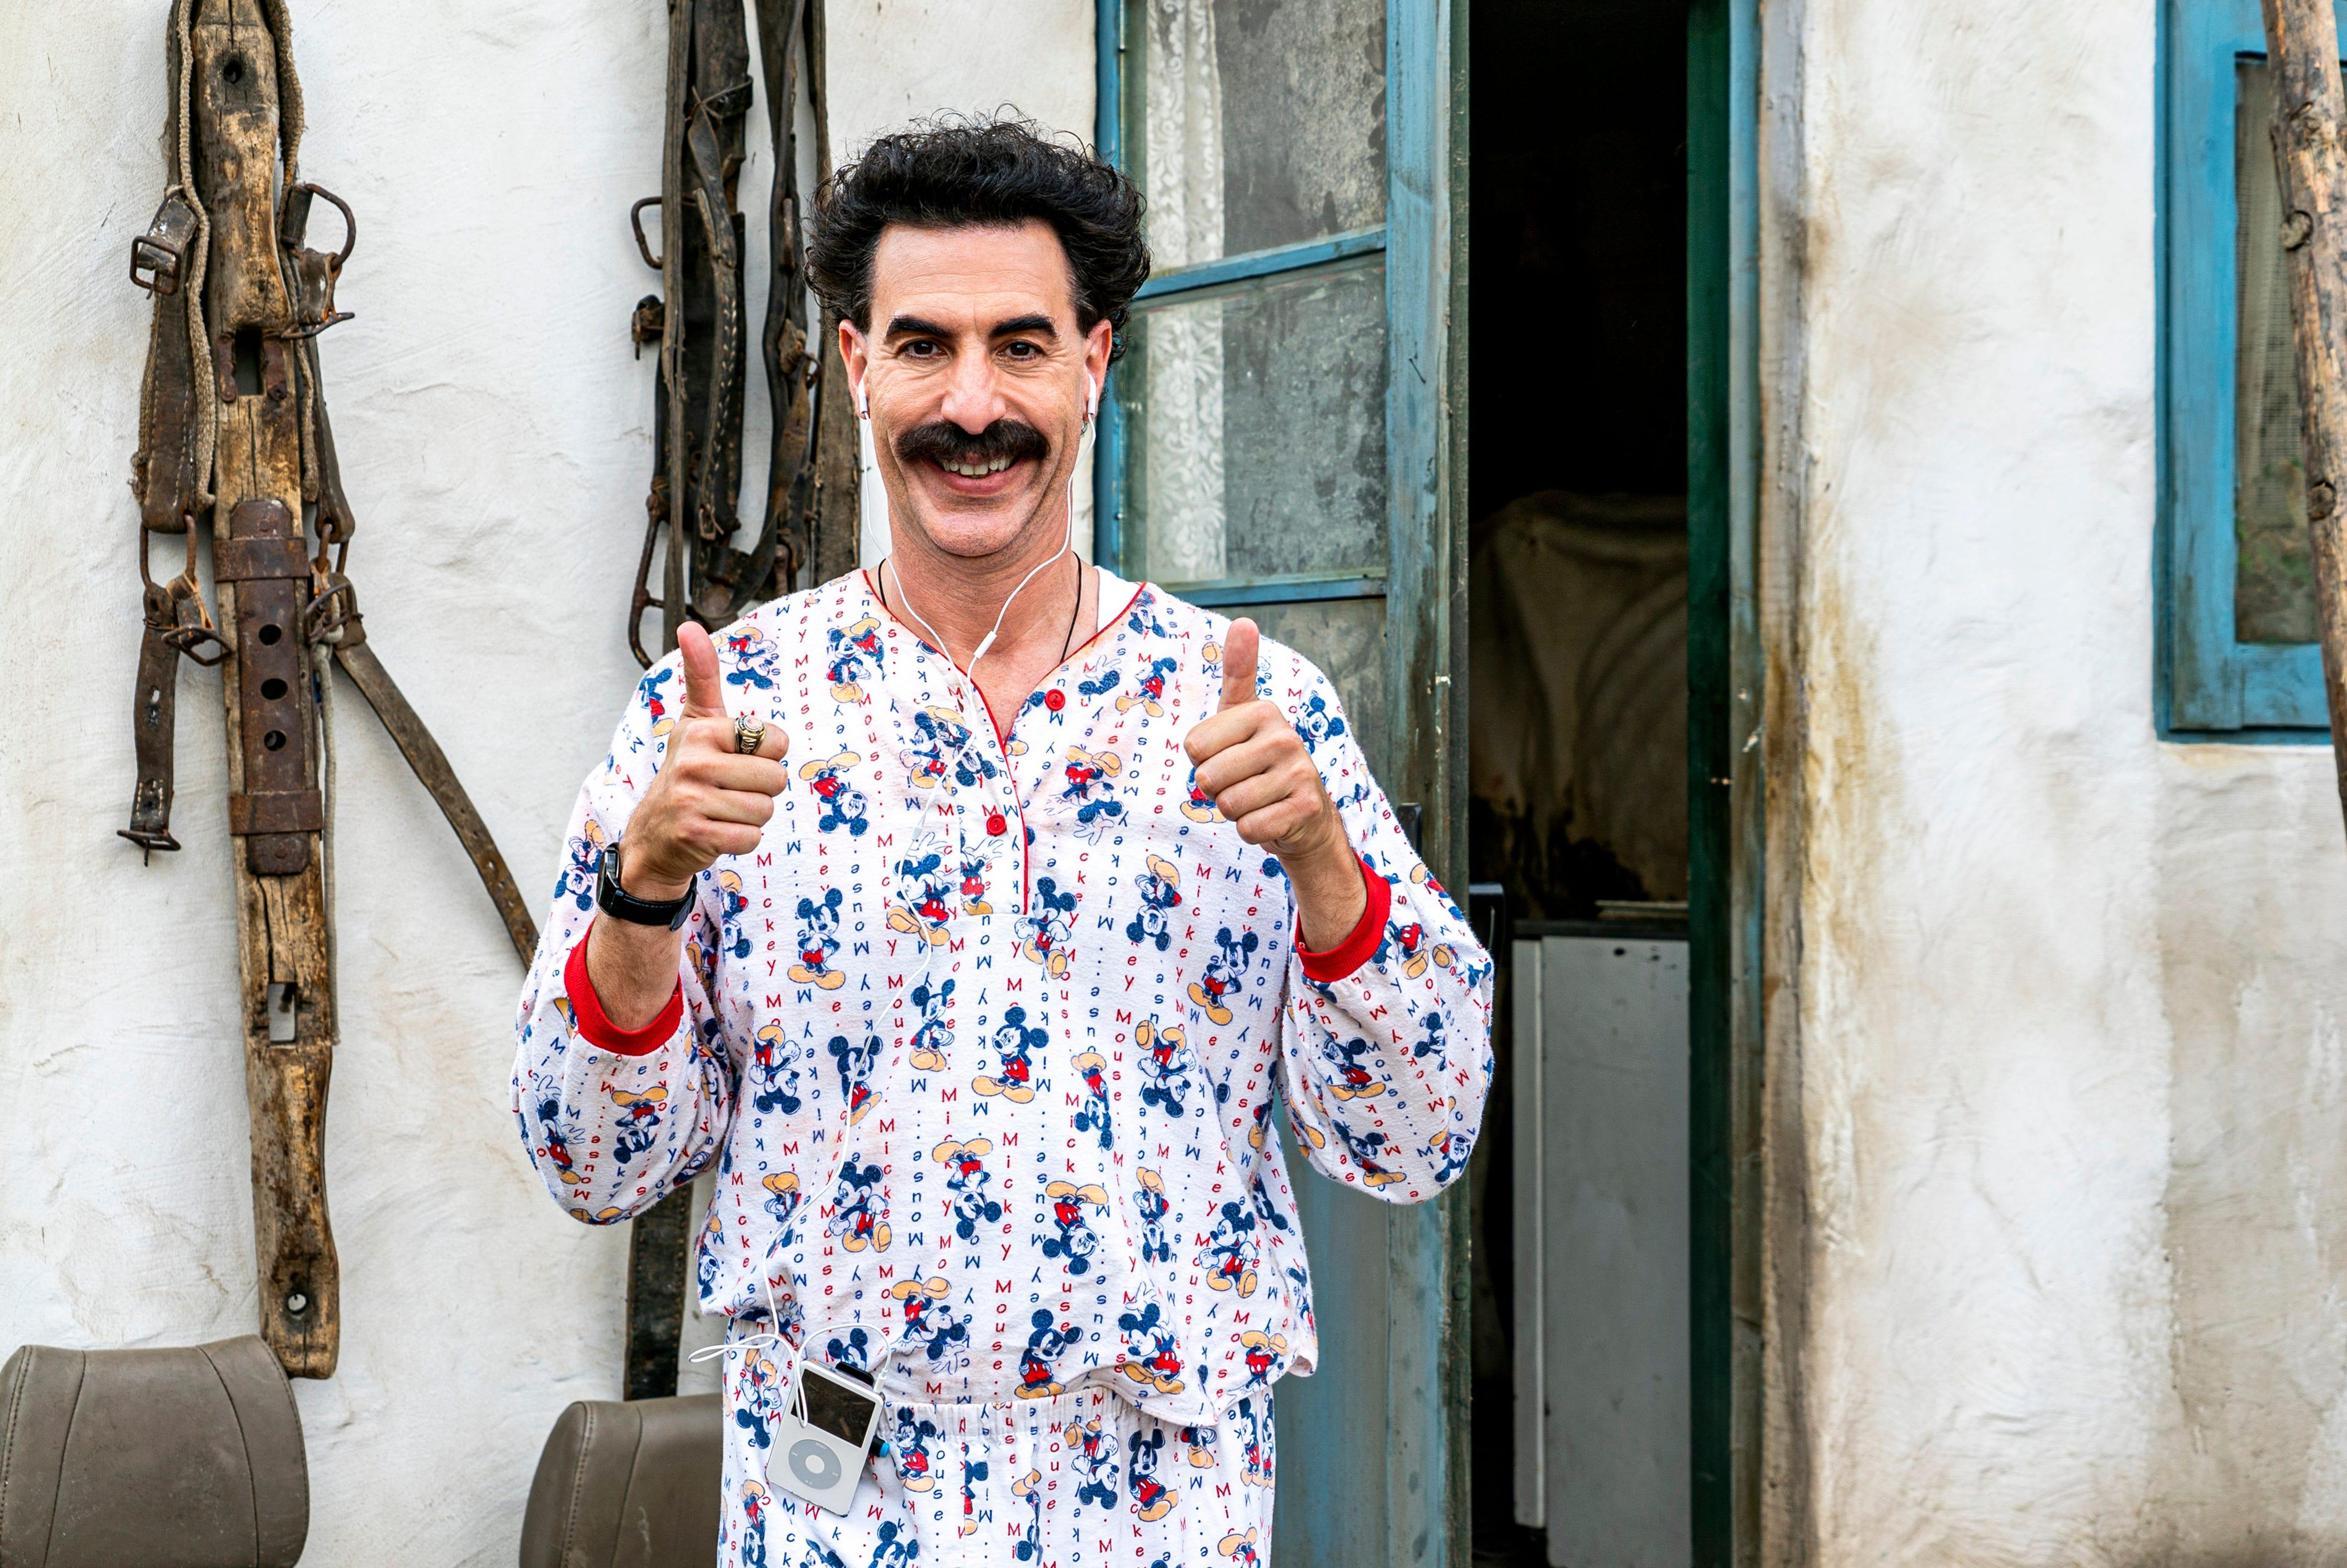 I here to defend America s mayor : Sacha Baron Cohen s Borat pokes at Rudy Giuliani, Trump online